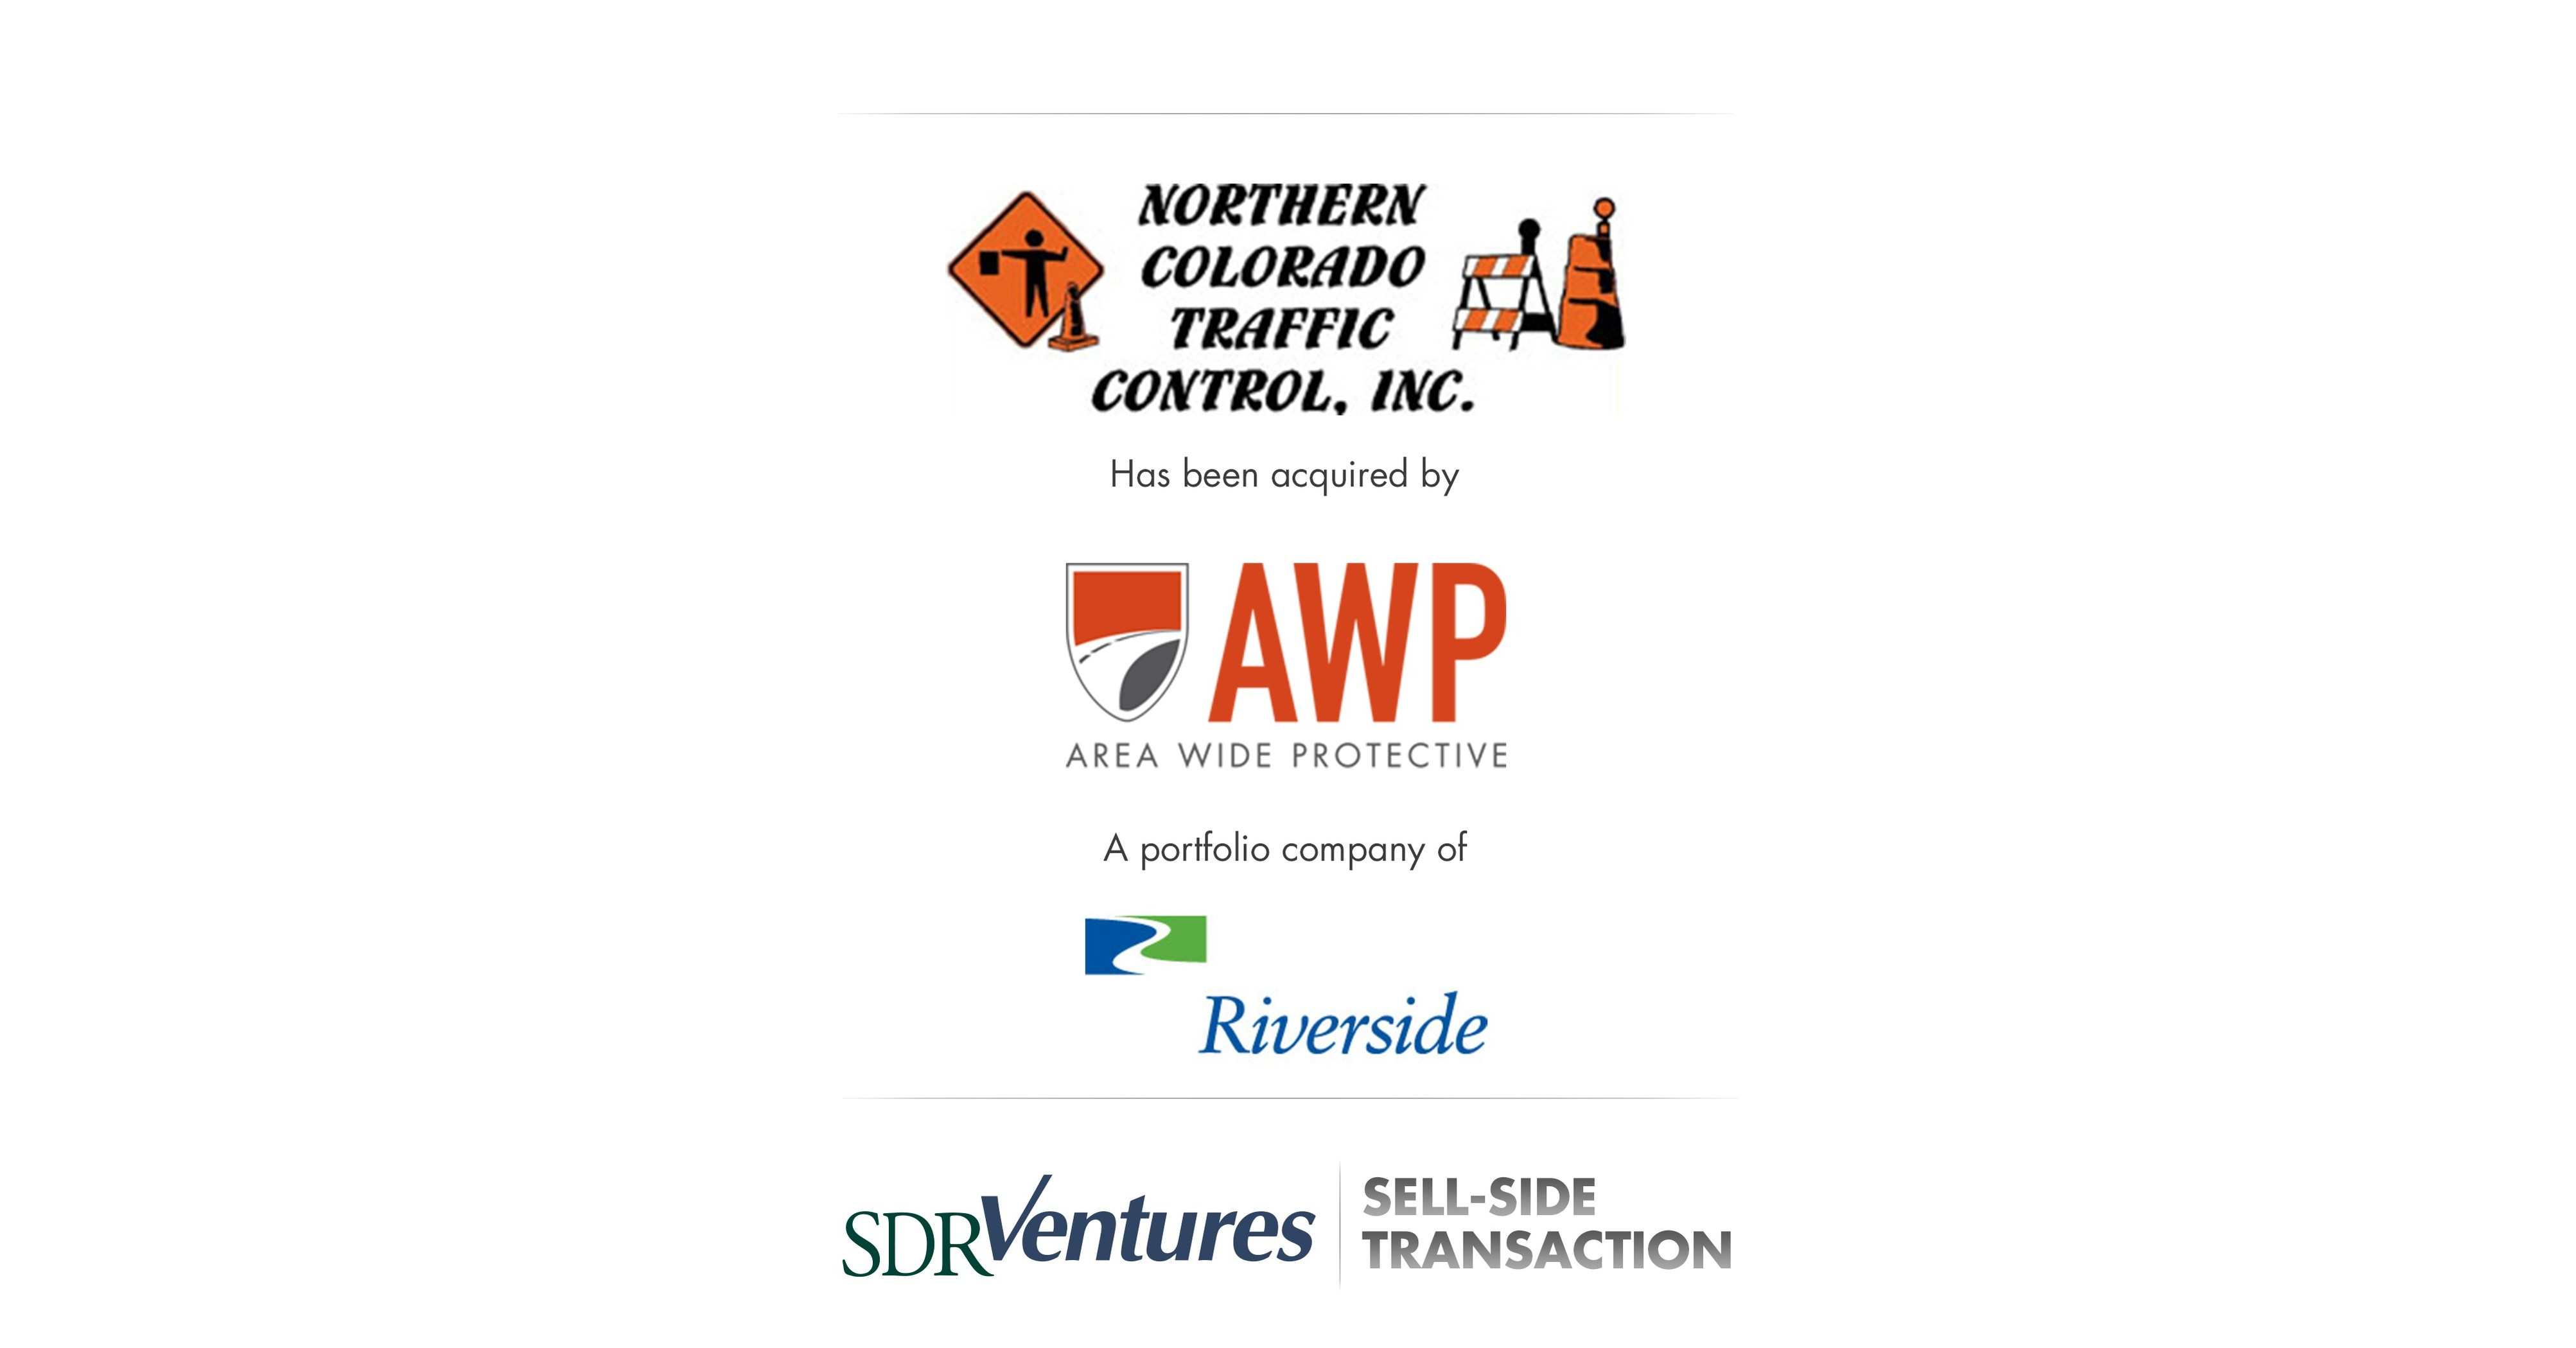 SDR Ventures Advises Northern Colorado Traffic Control on